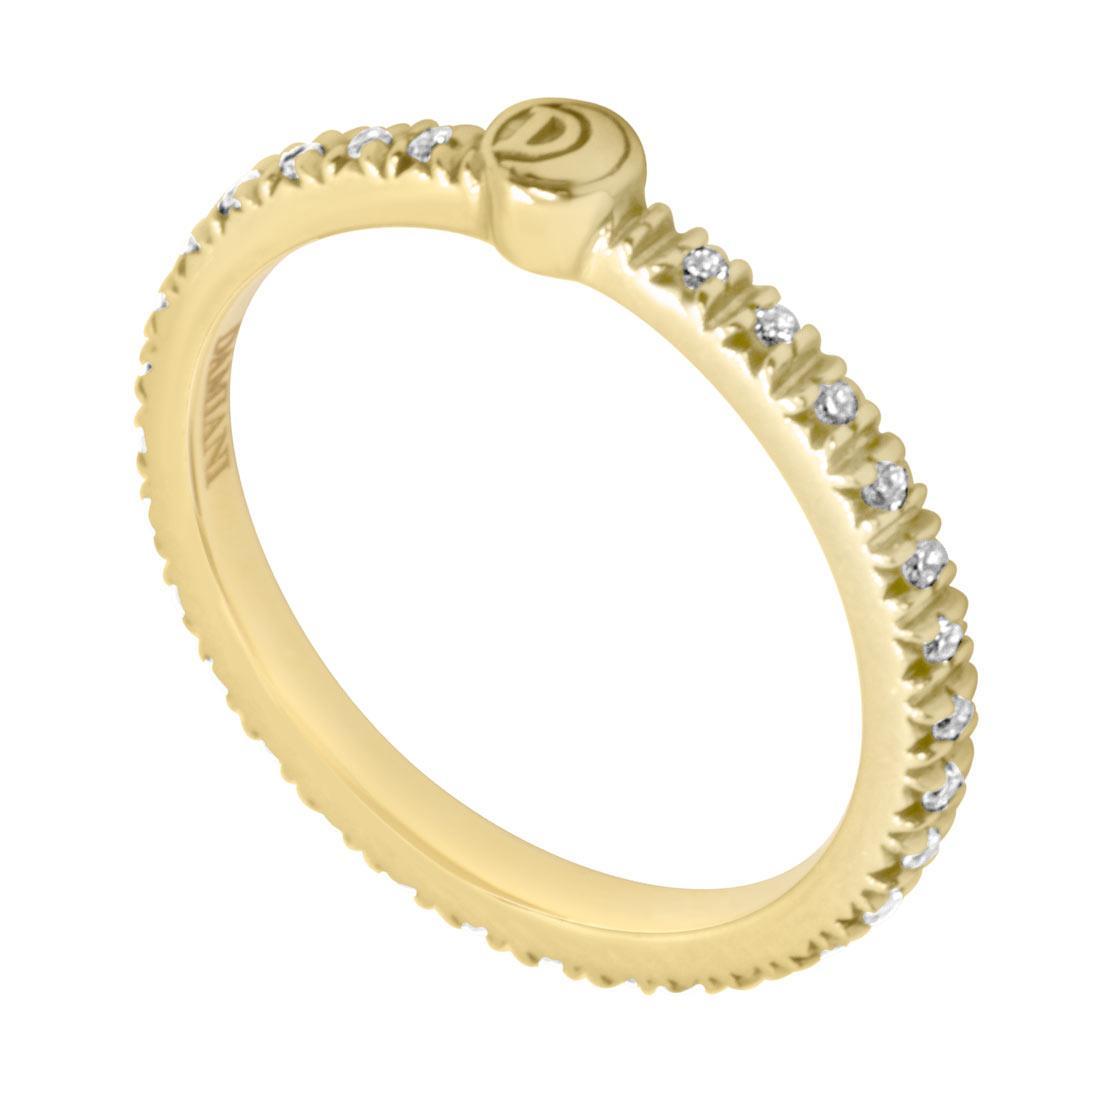 Anello Damiani con diamanti mis 12 - DAMIANI